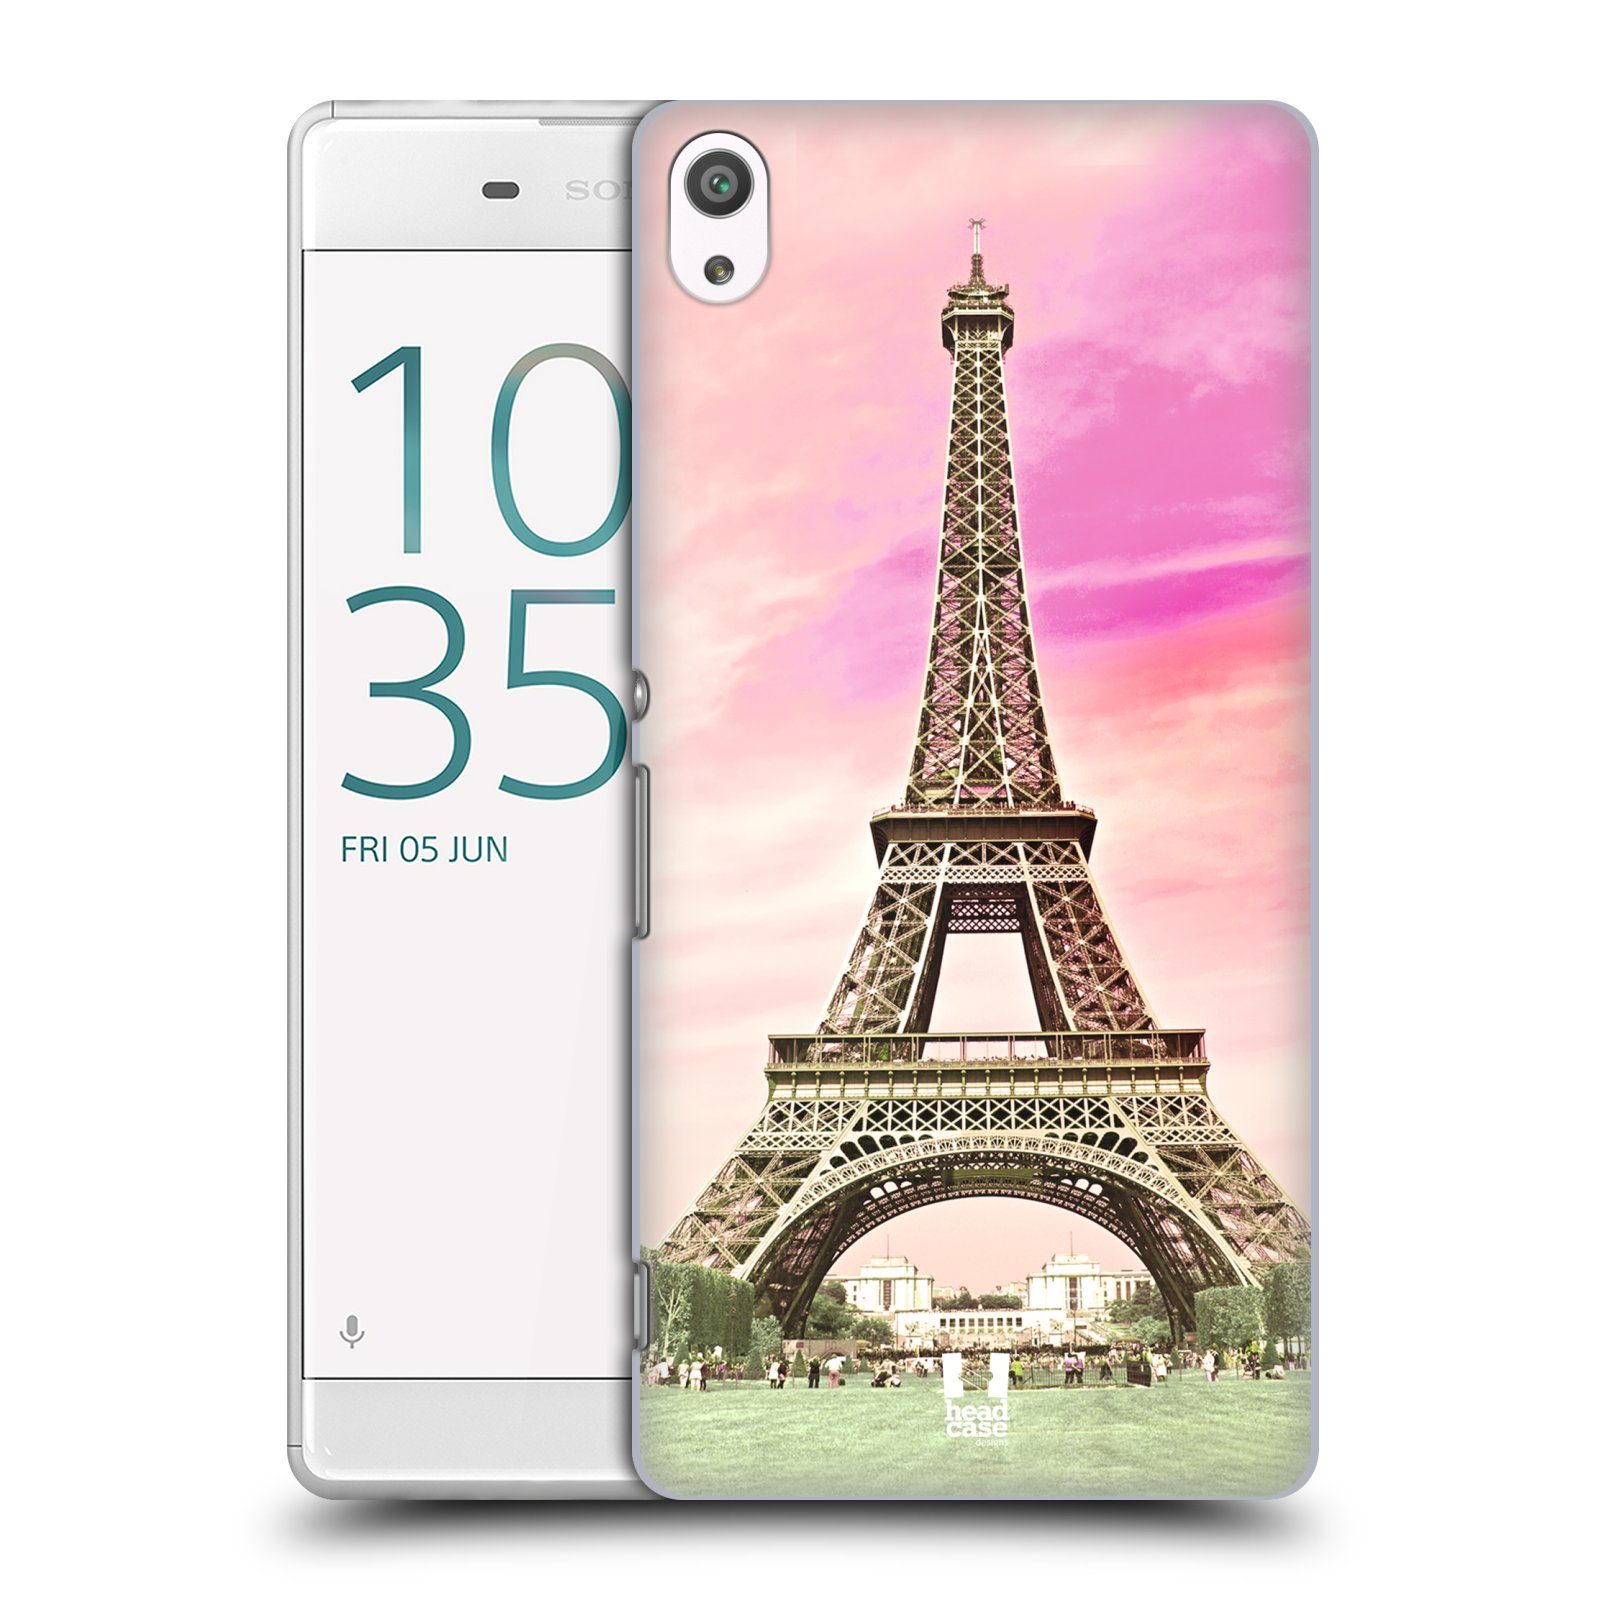 Pouzdro na mobil Sony Xperia XA ULTRA - HEAD CASE - historická místa Eiffelova věž Paříž